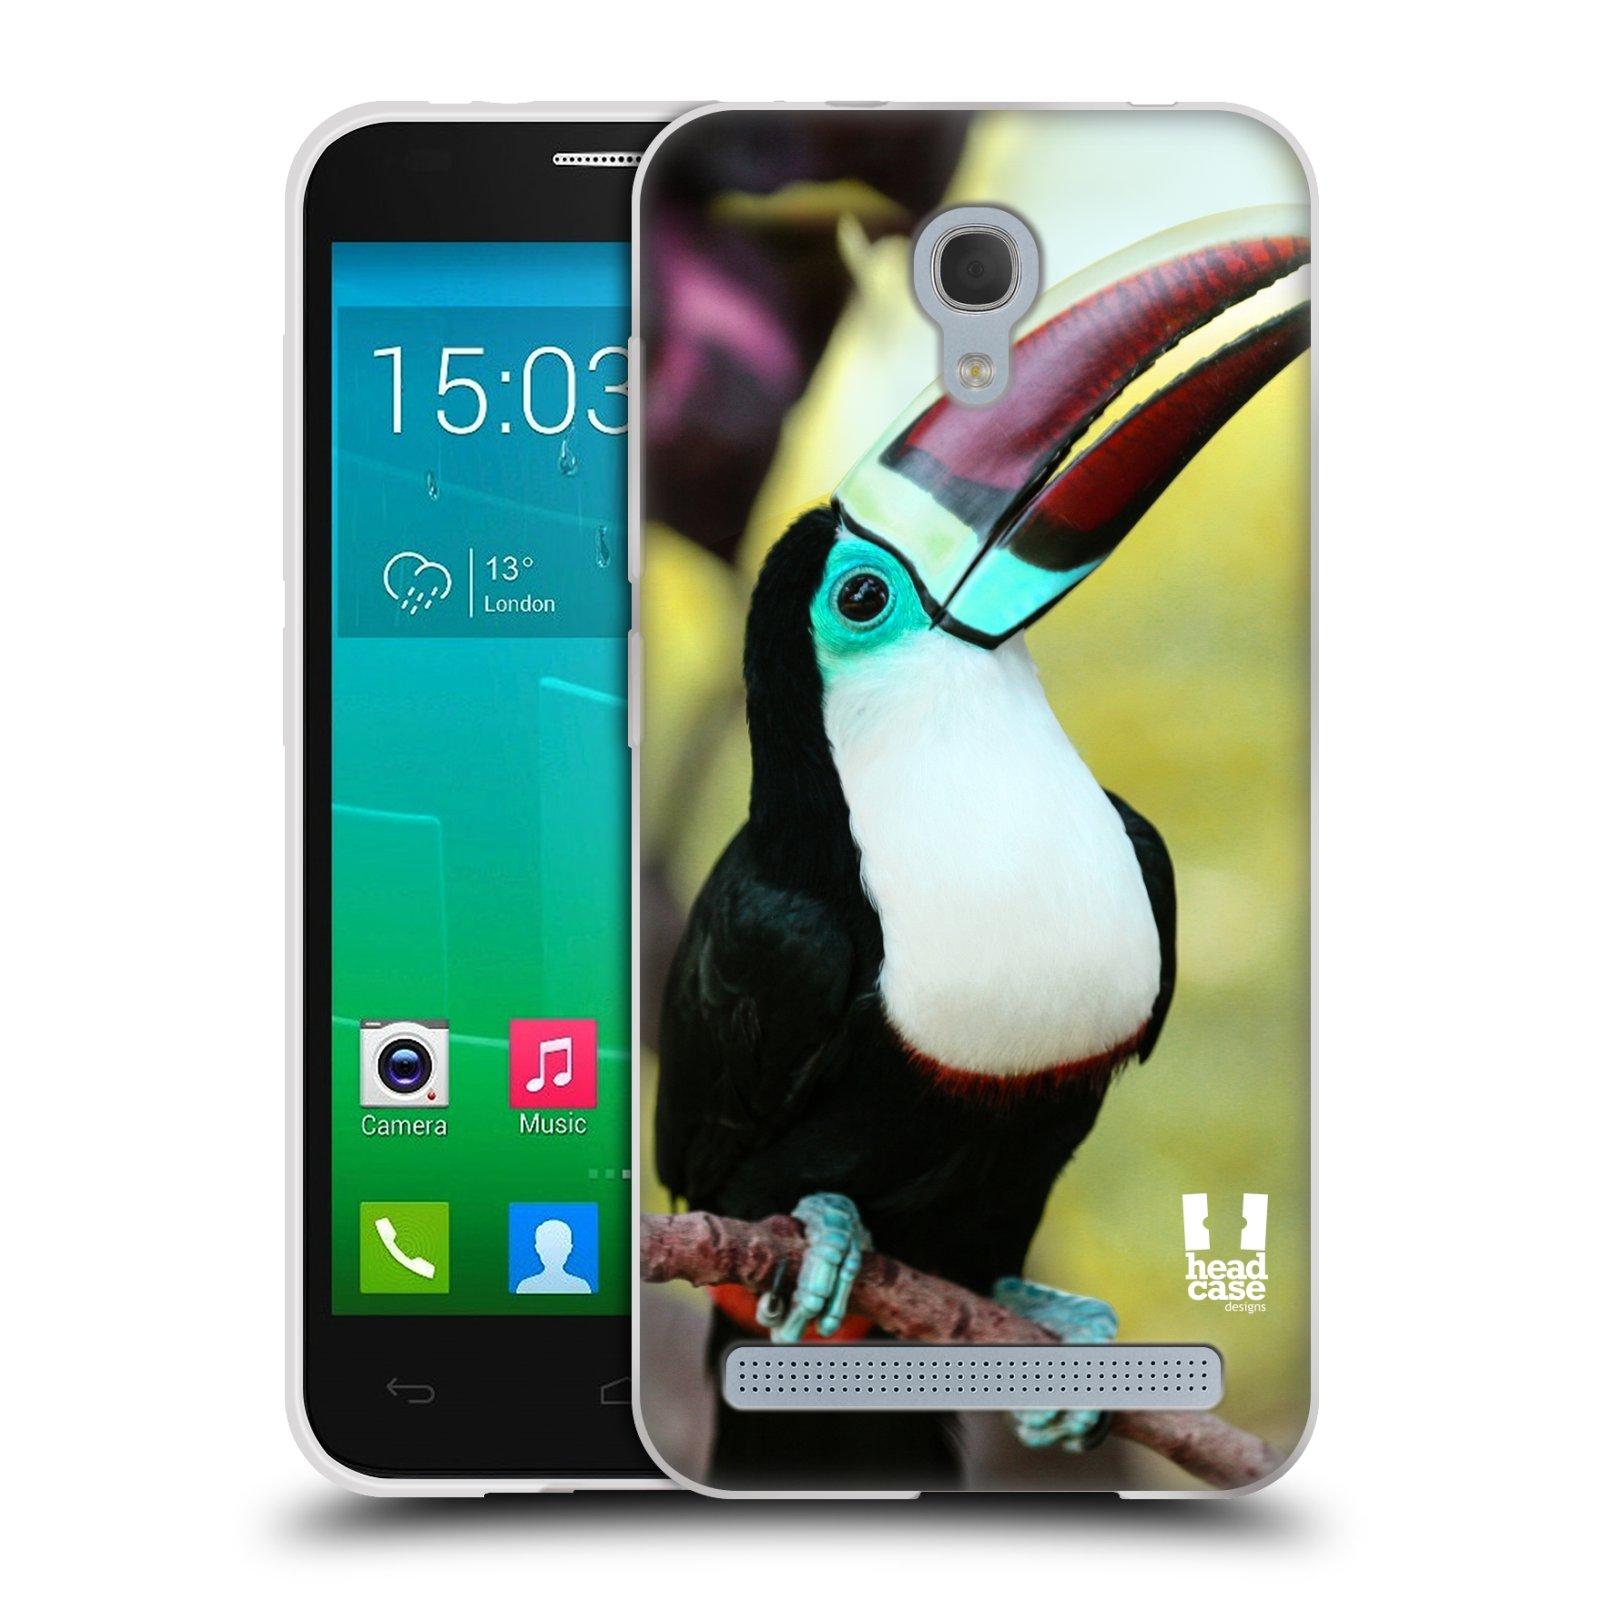 HEAD CASE silikonový obal na mobil Alcatel Idol 2 MINI S 6036Y vzor slavná zvířata foto tukan